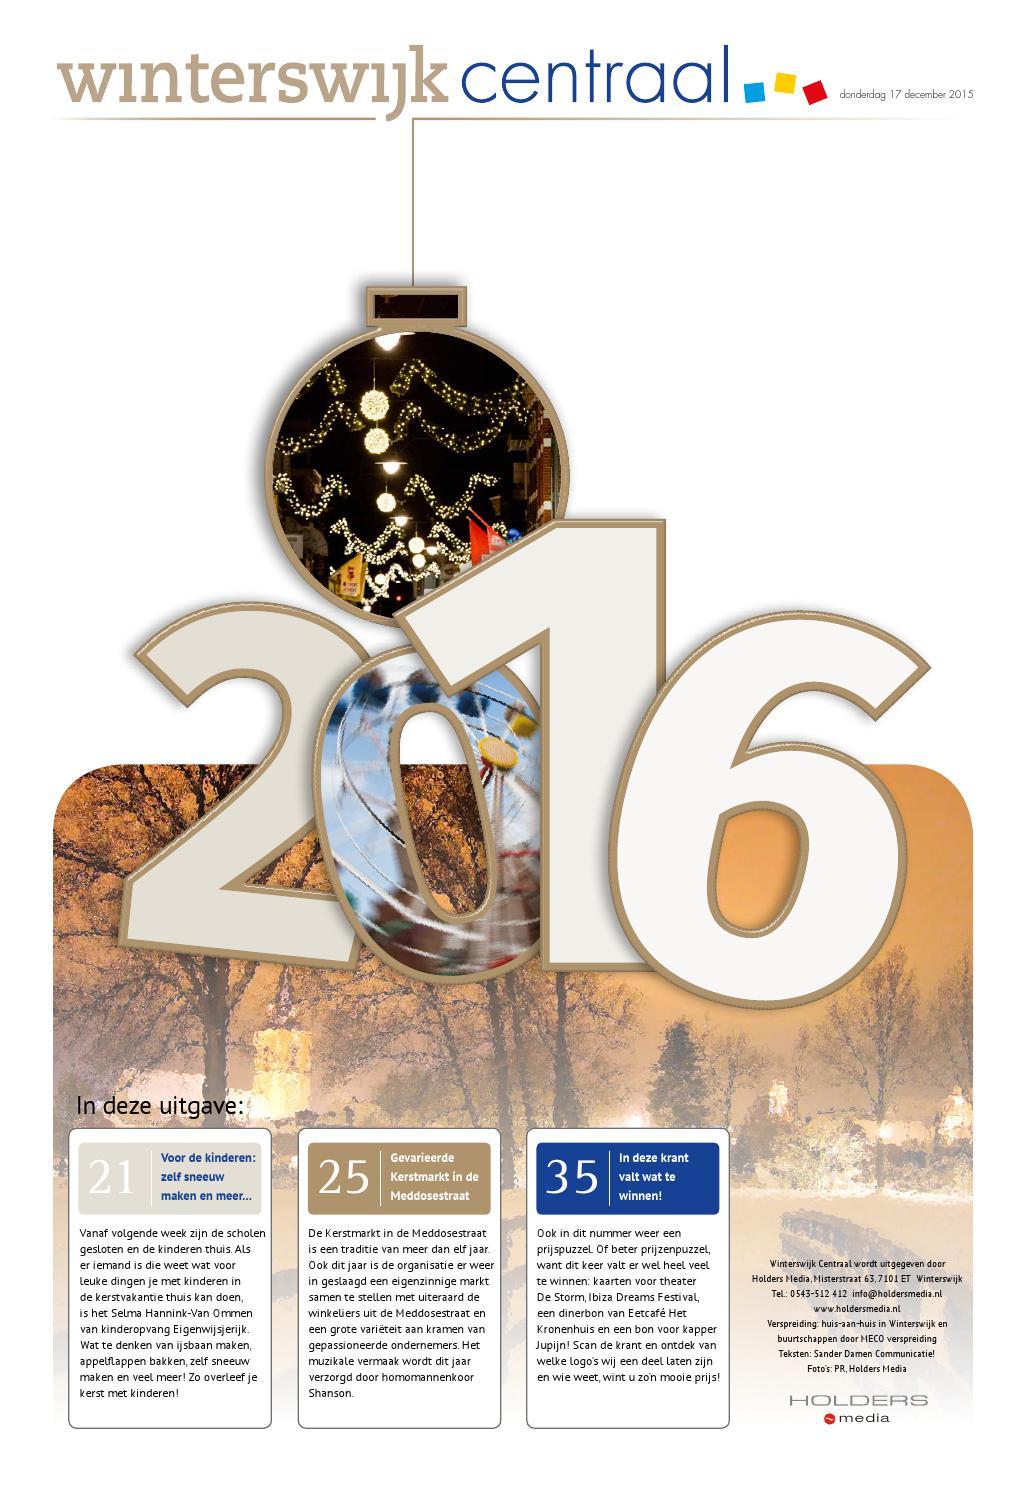 aa5f0e524ad Winterswijk centraal december 1215 by Holders Media - issuu